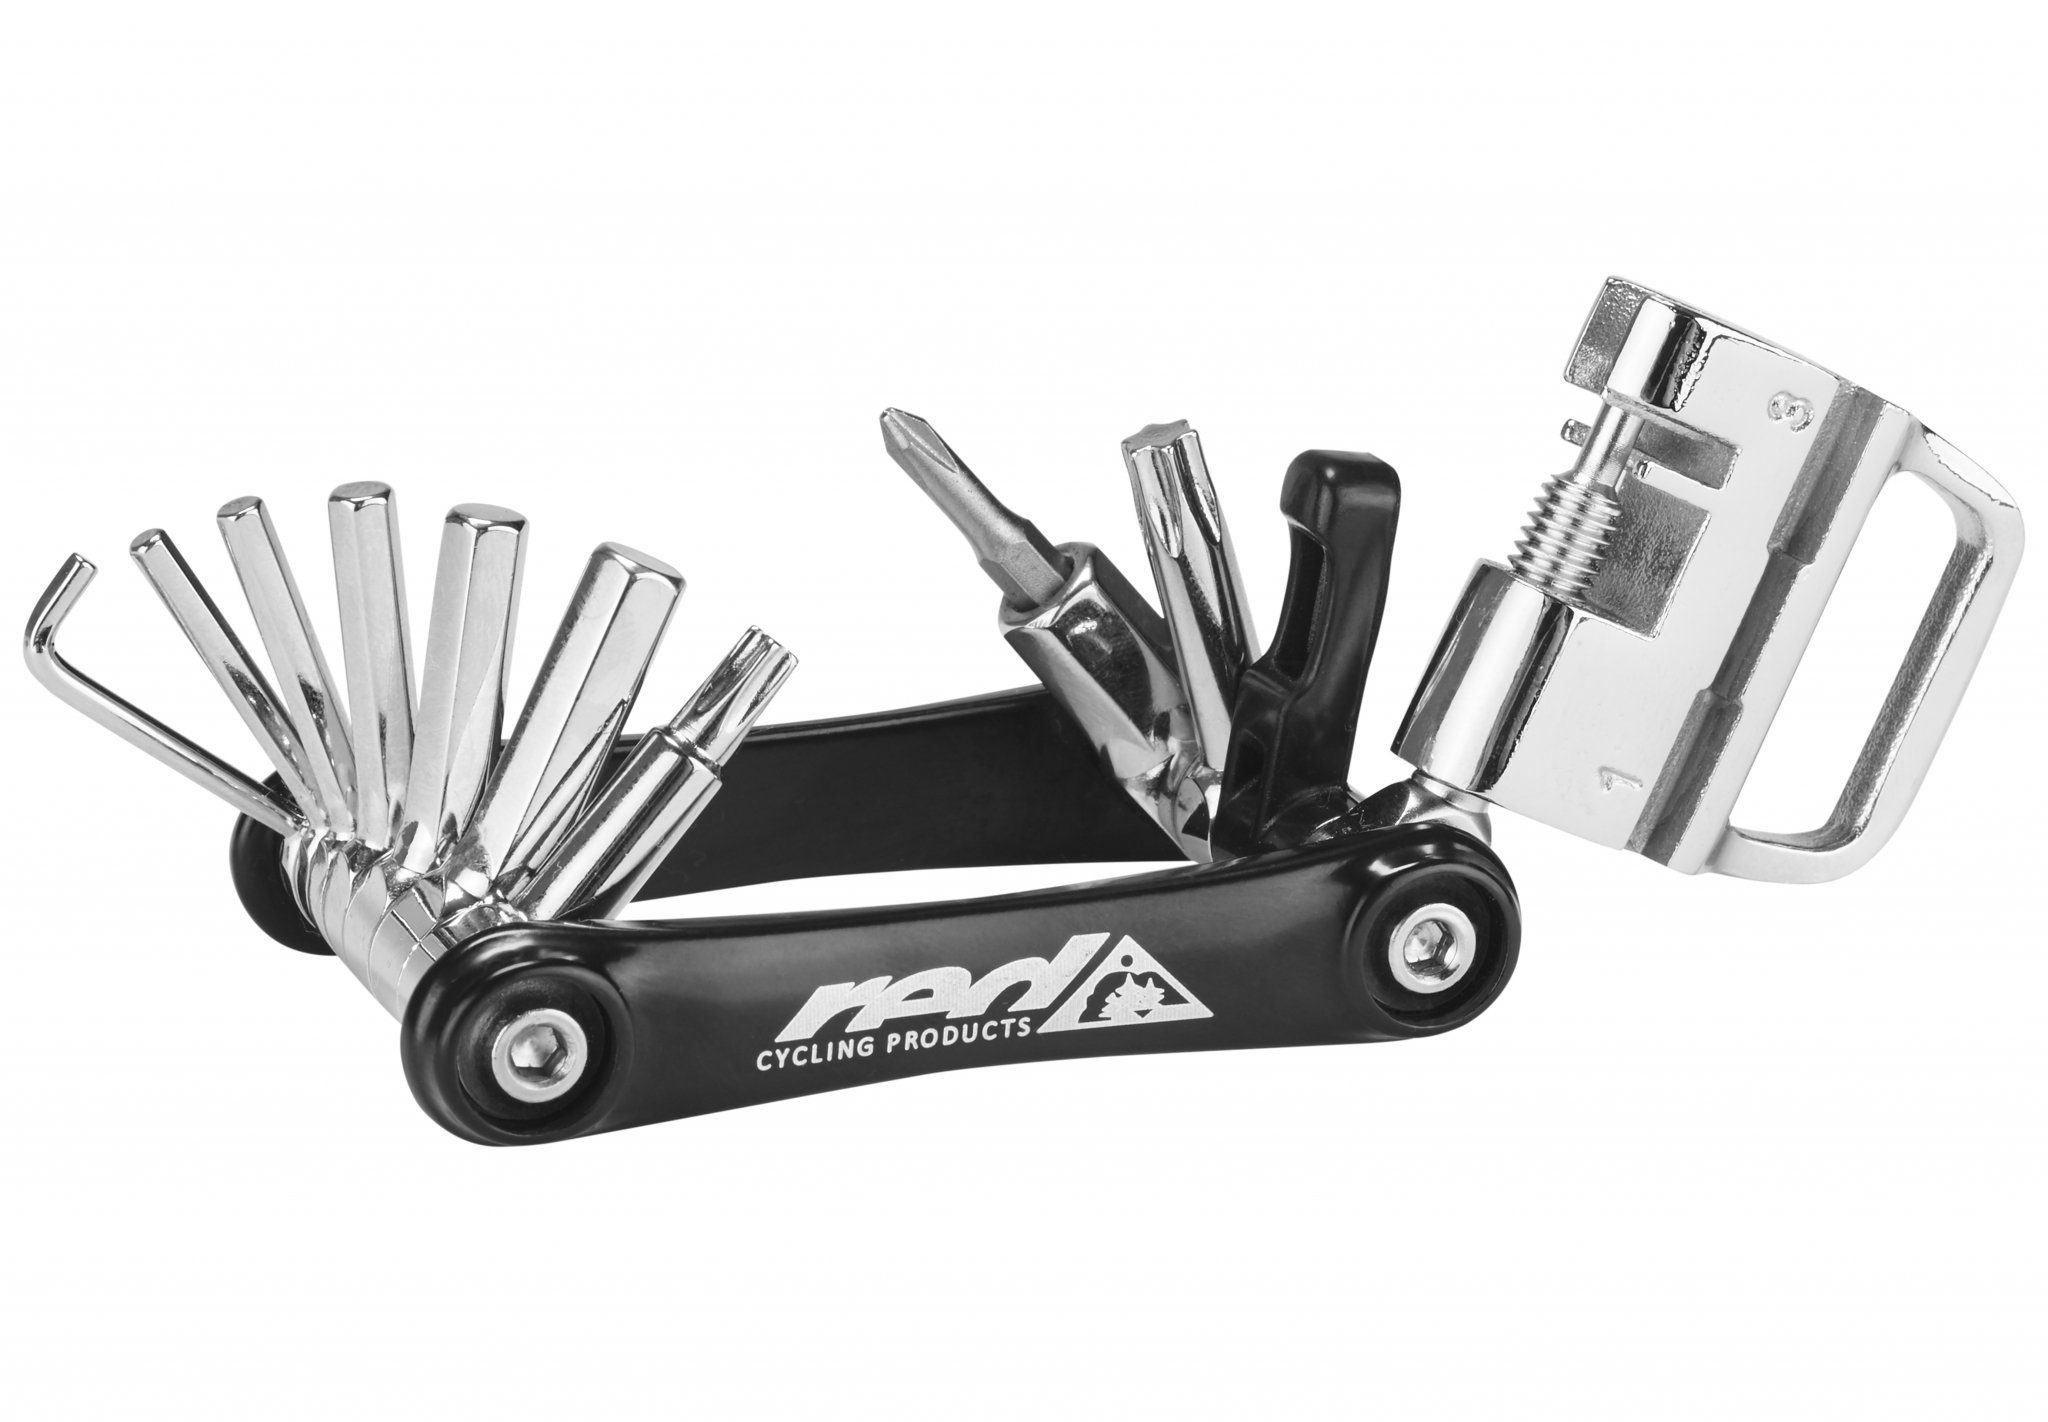 Red Cycling Products Werkzeug & Montage »PRO Tool 16 in 1 Miniwerkzeug«